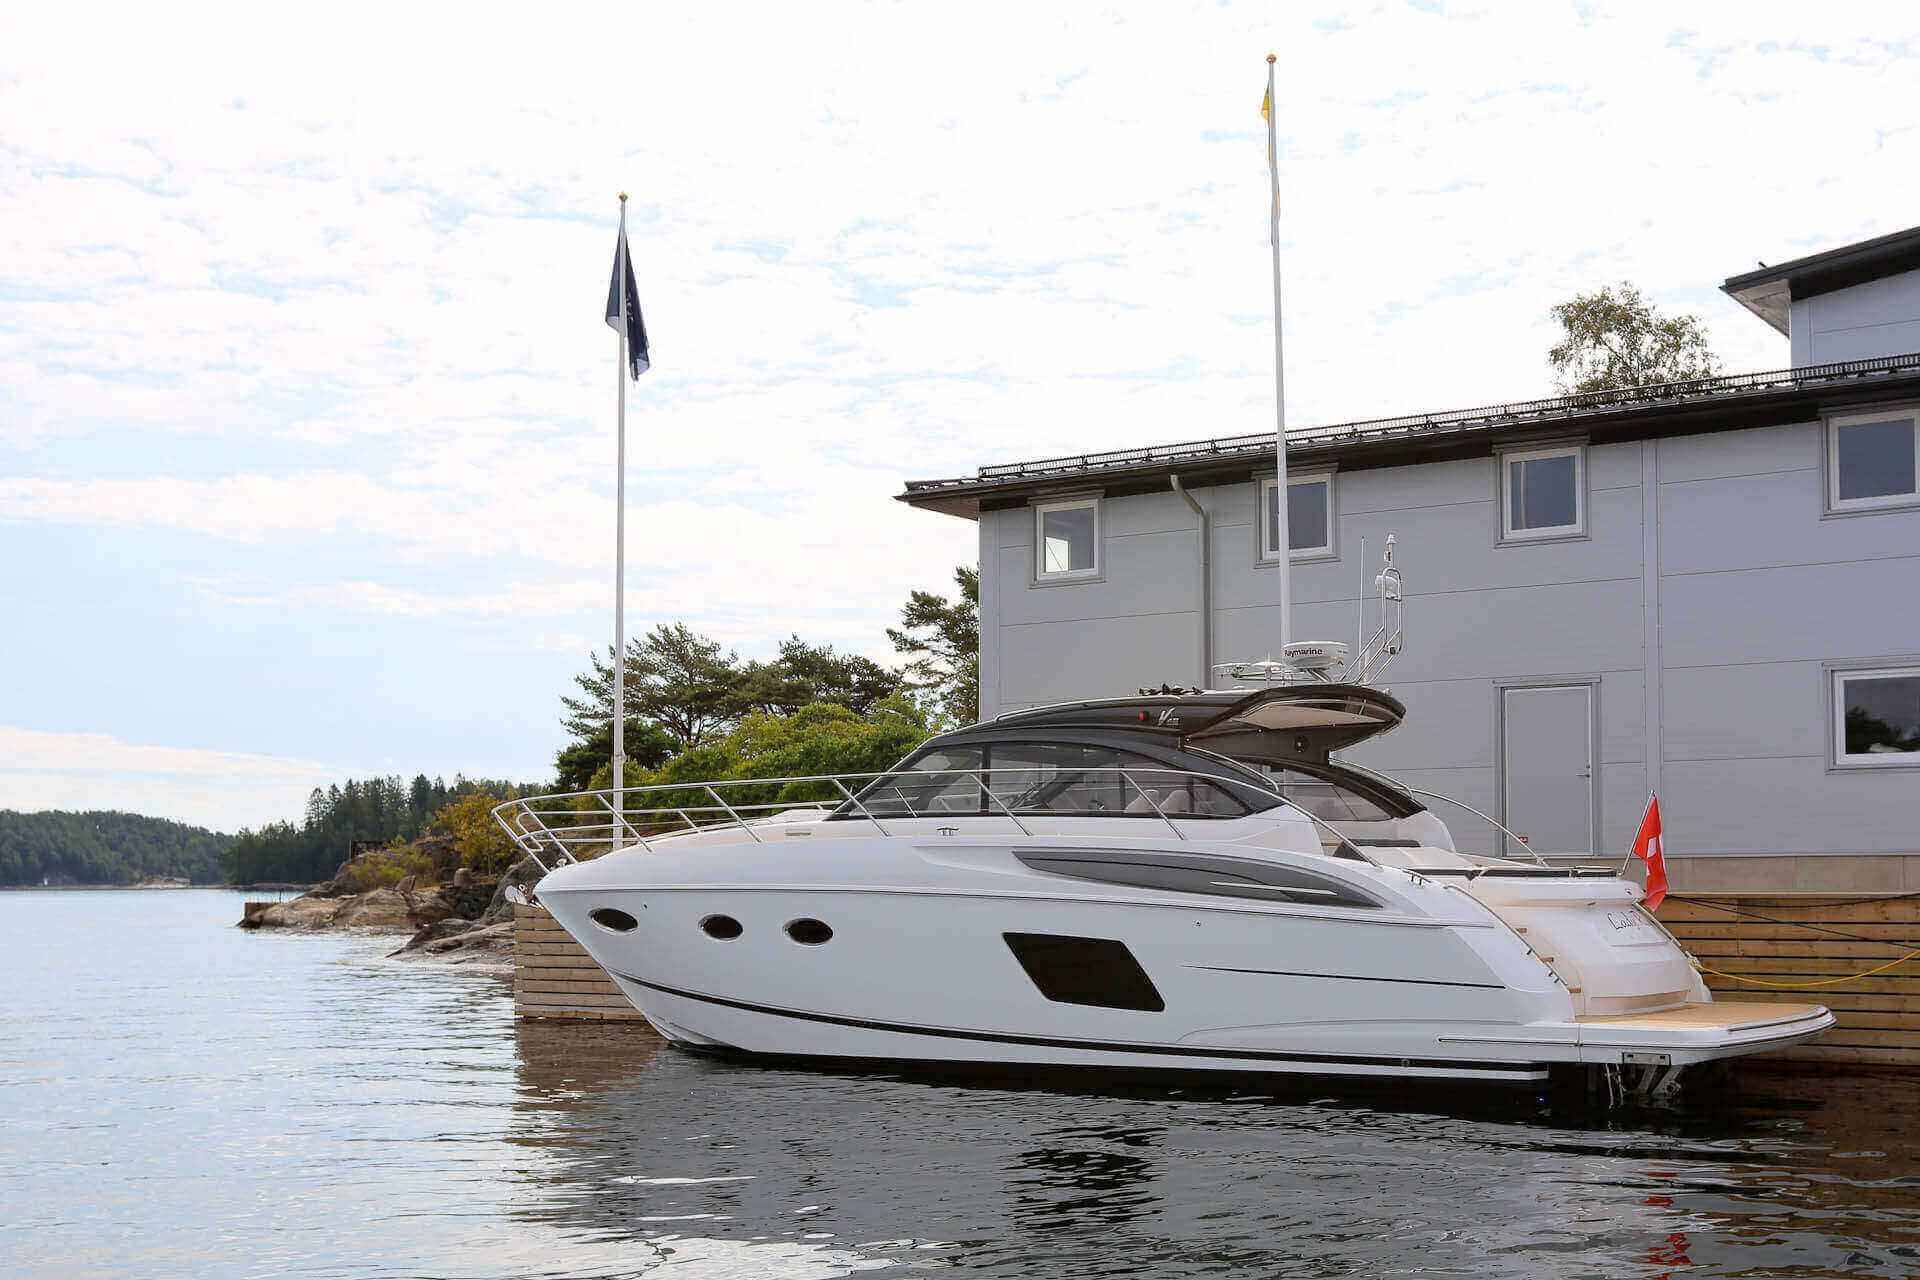 New Photos Of Princess V48 Open Princess Yachts Sweden Denmark Norway